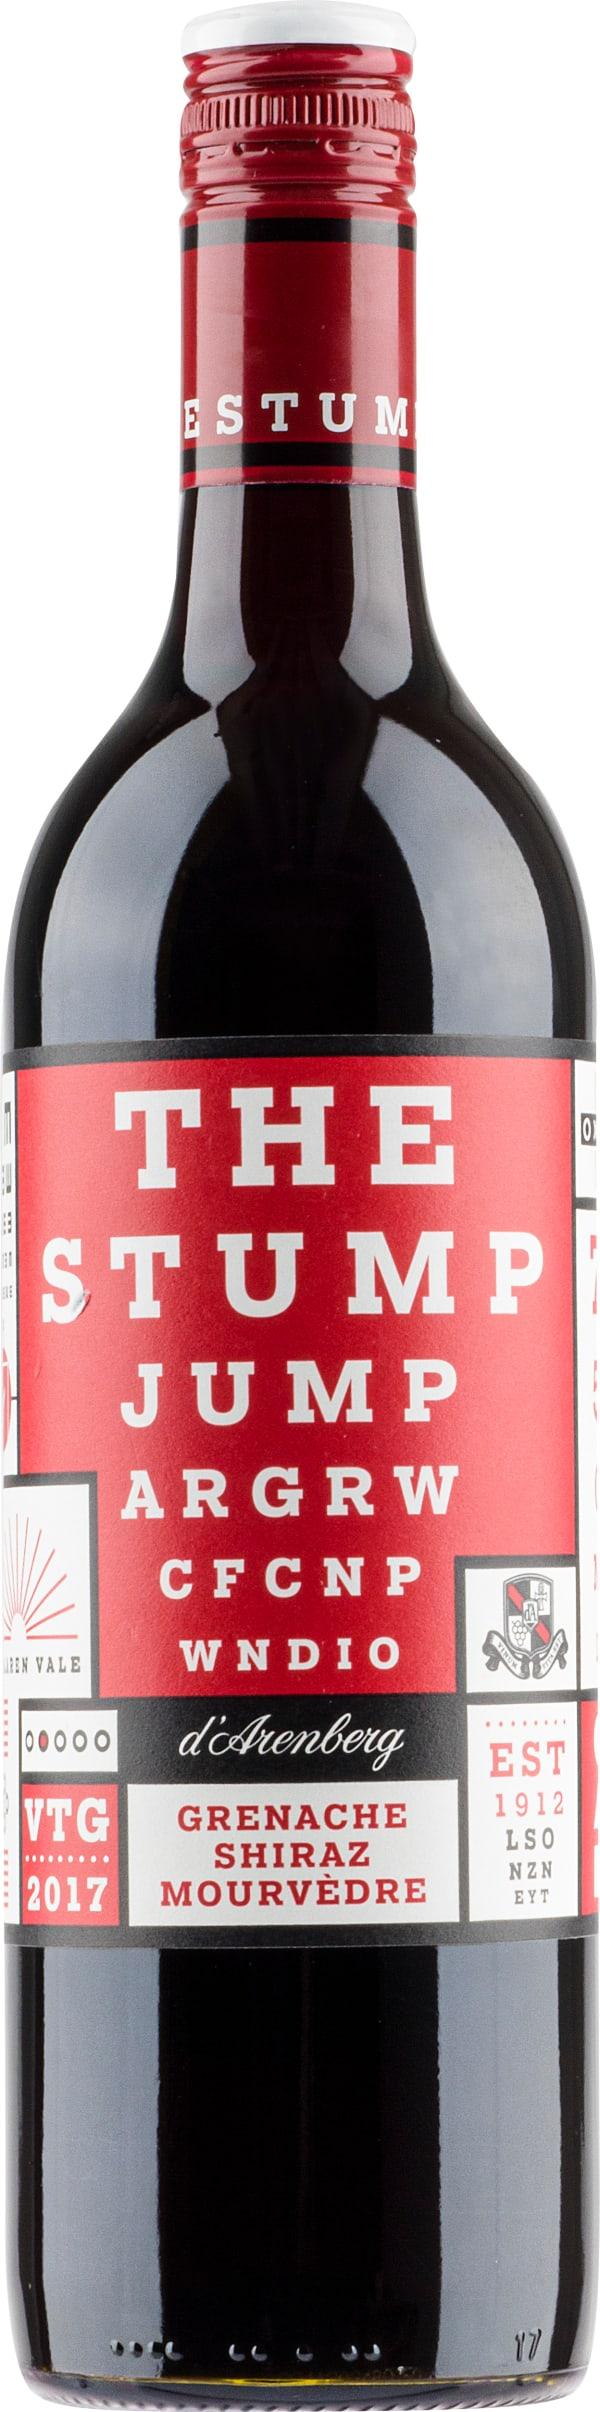 D'Arenberg The Stump Jump GSM 2017